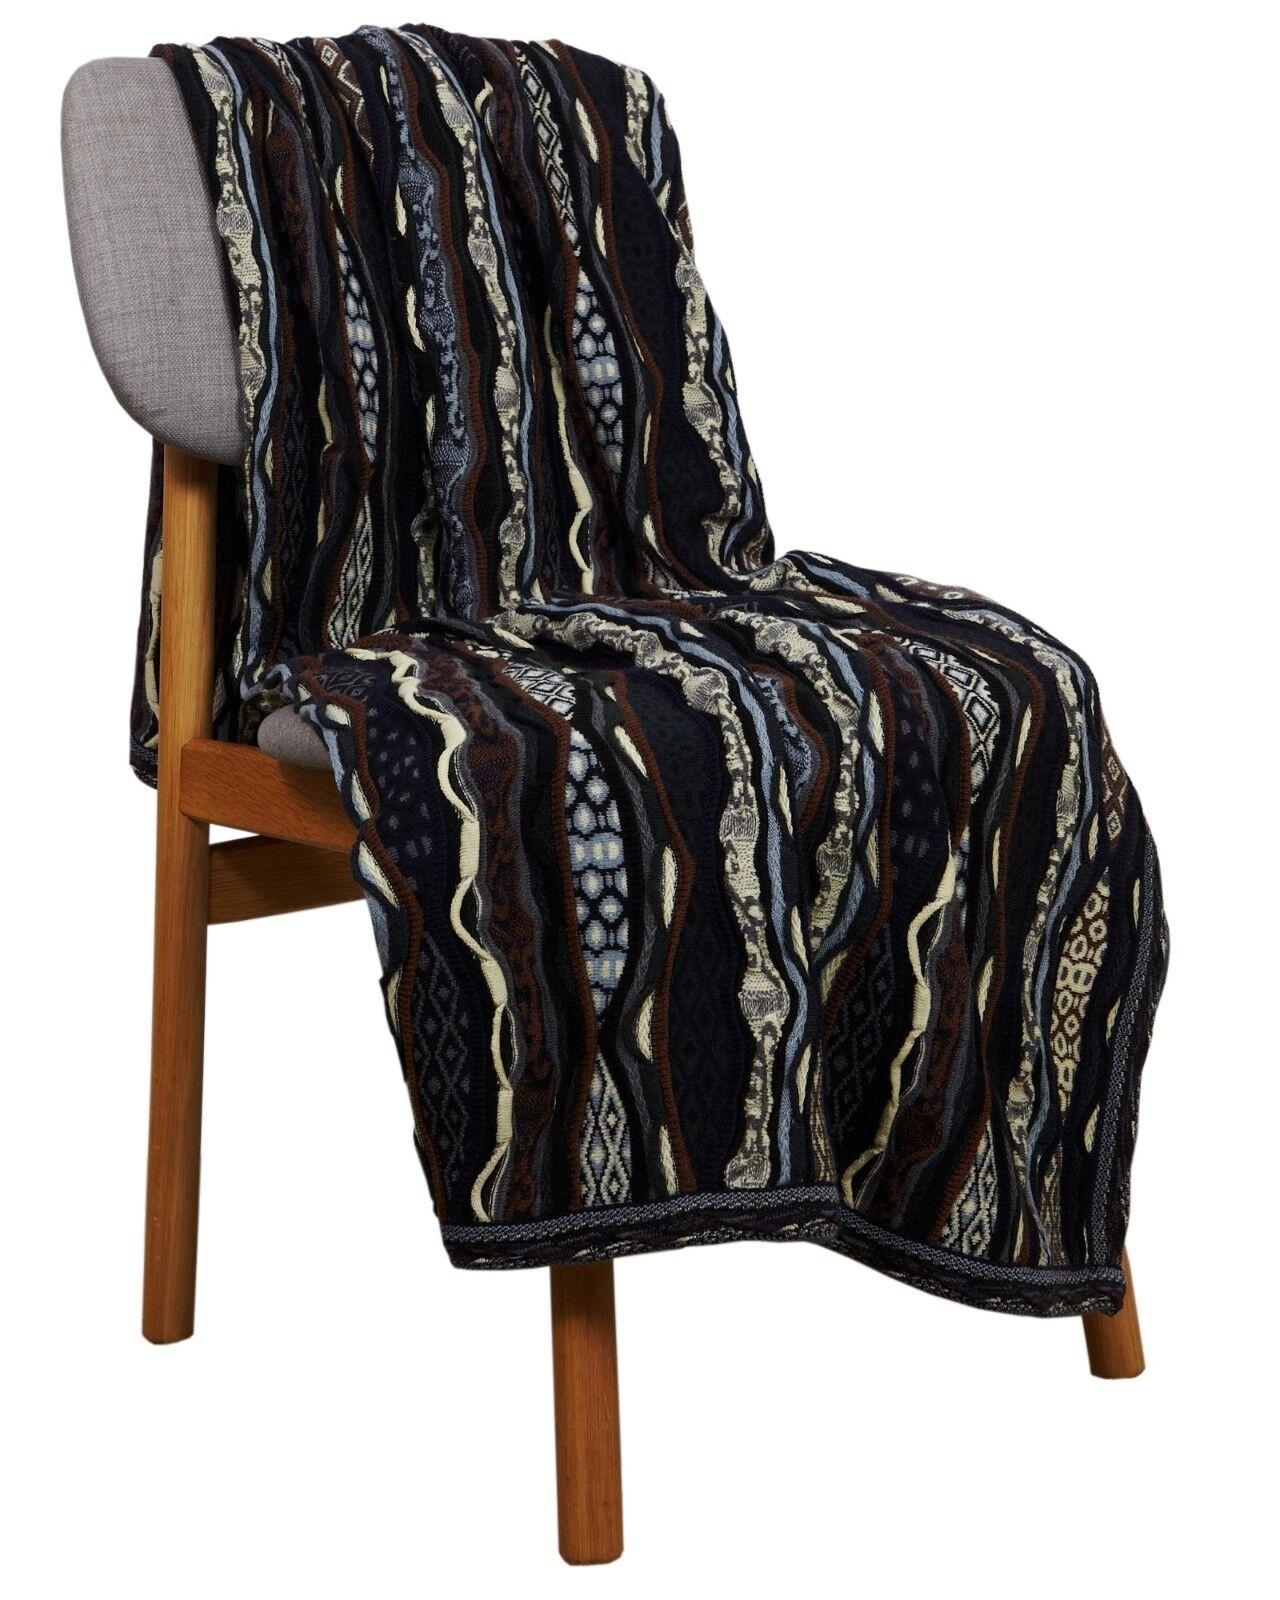 Geccu 3D Multi Colour Merino Wool Blanket Bed Throw, Knitwear Sweater Jumper